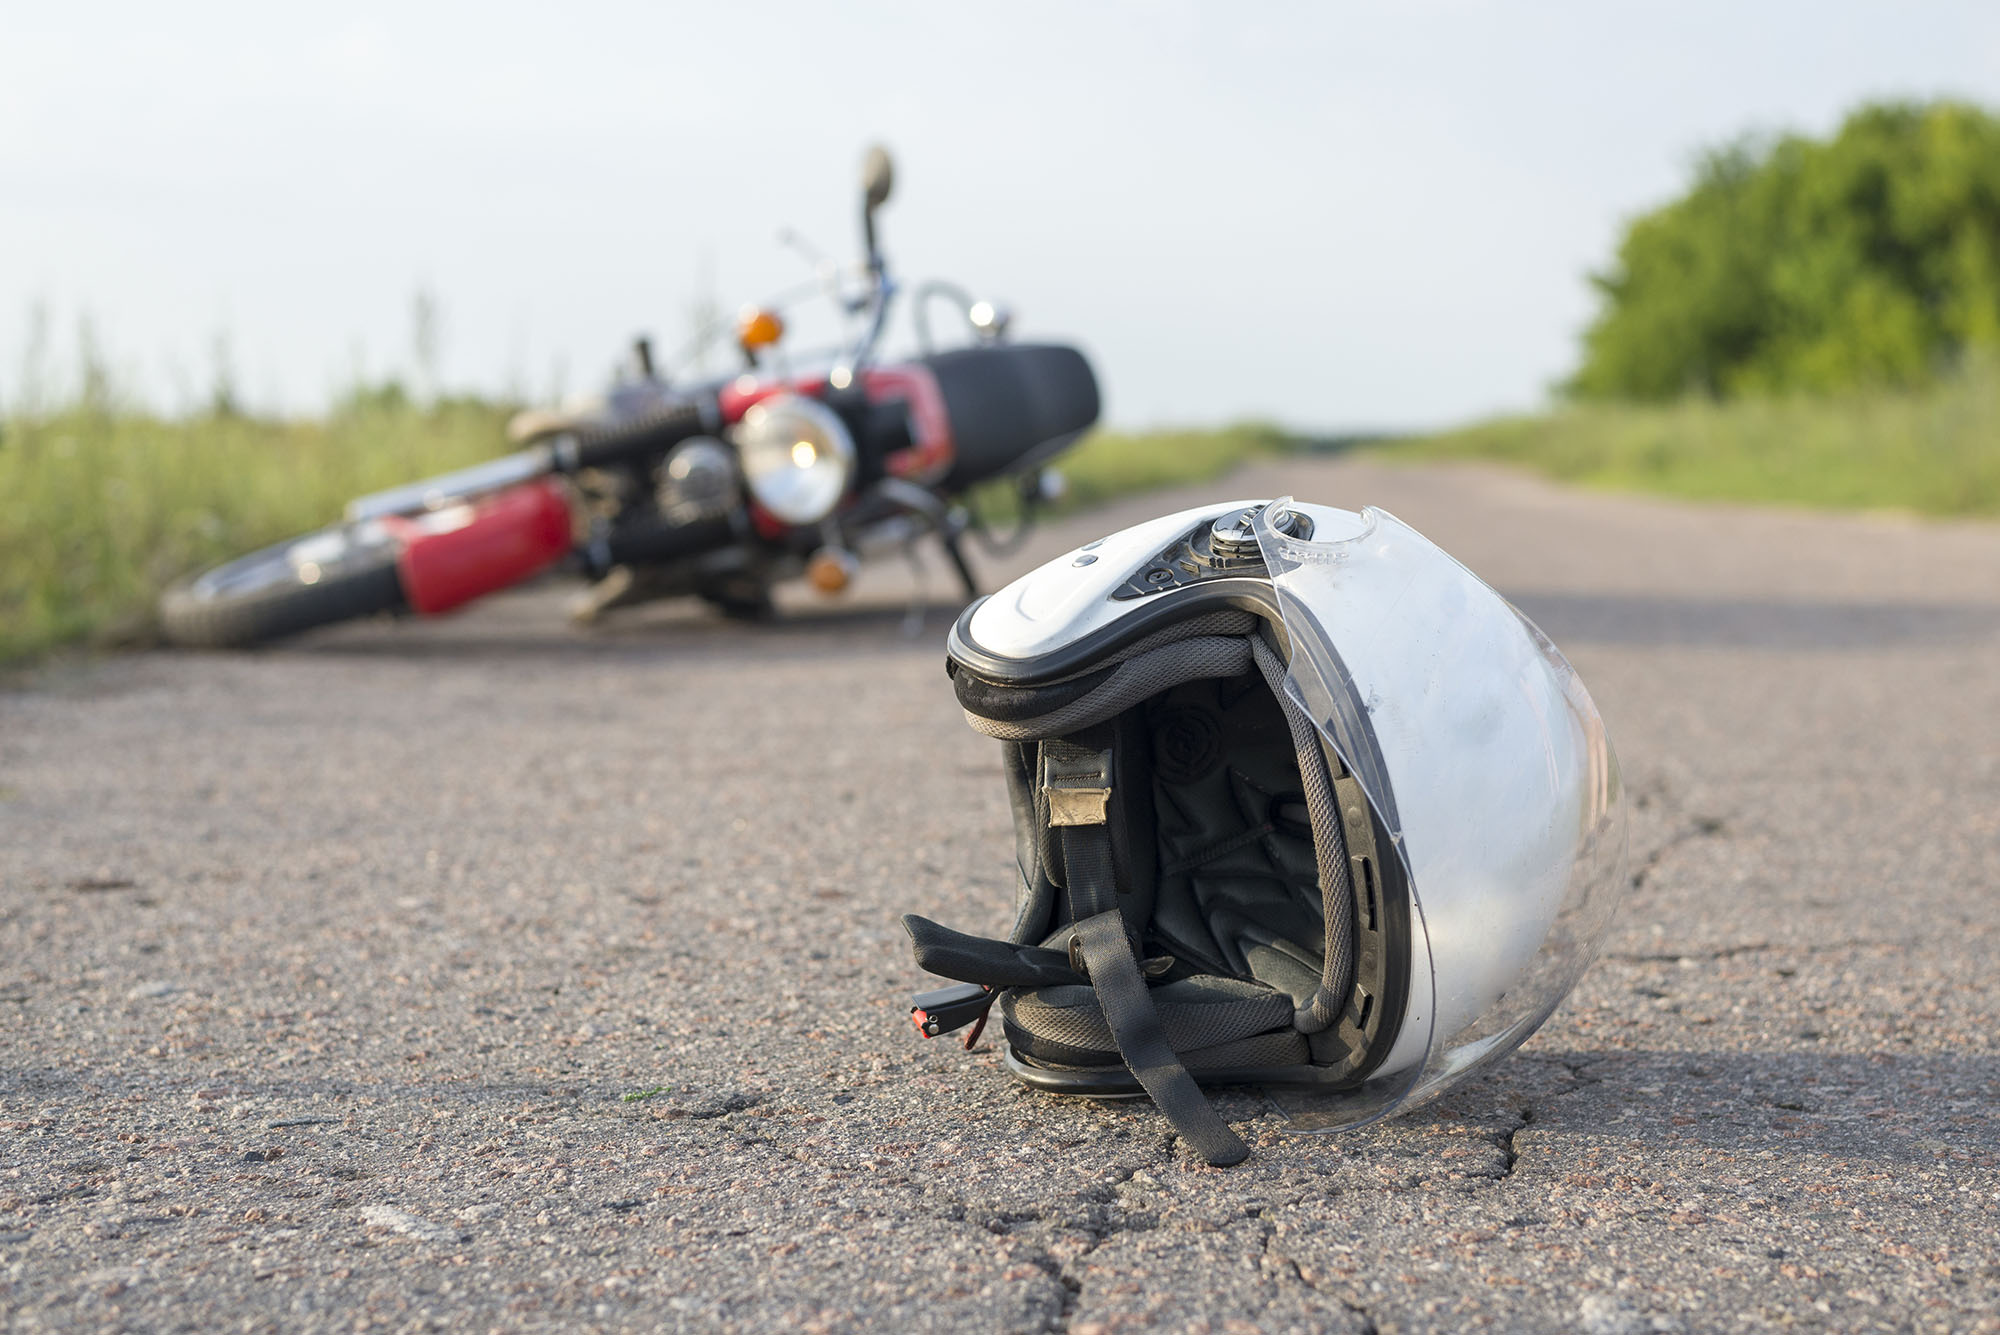 motorbike accident compensation claim solicitors Aberdeen